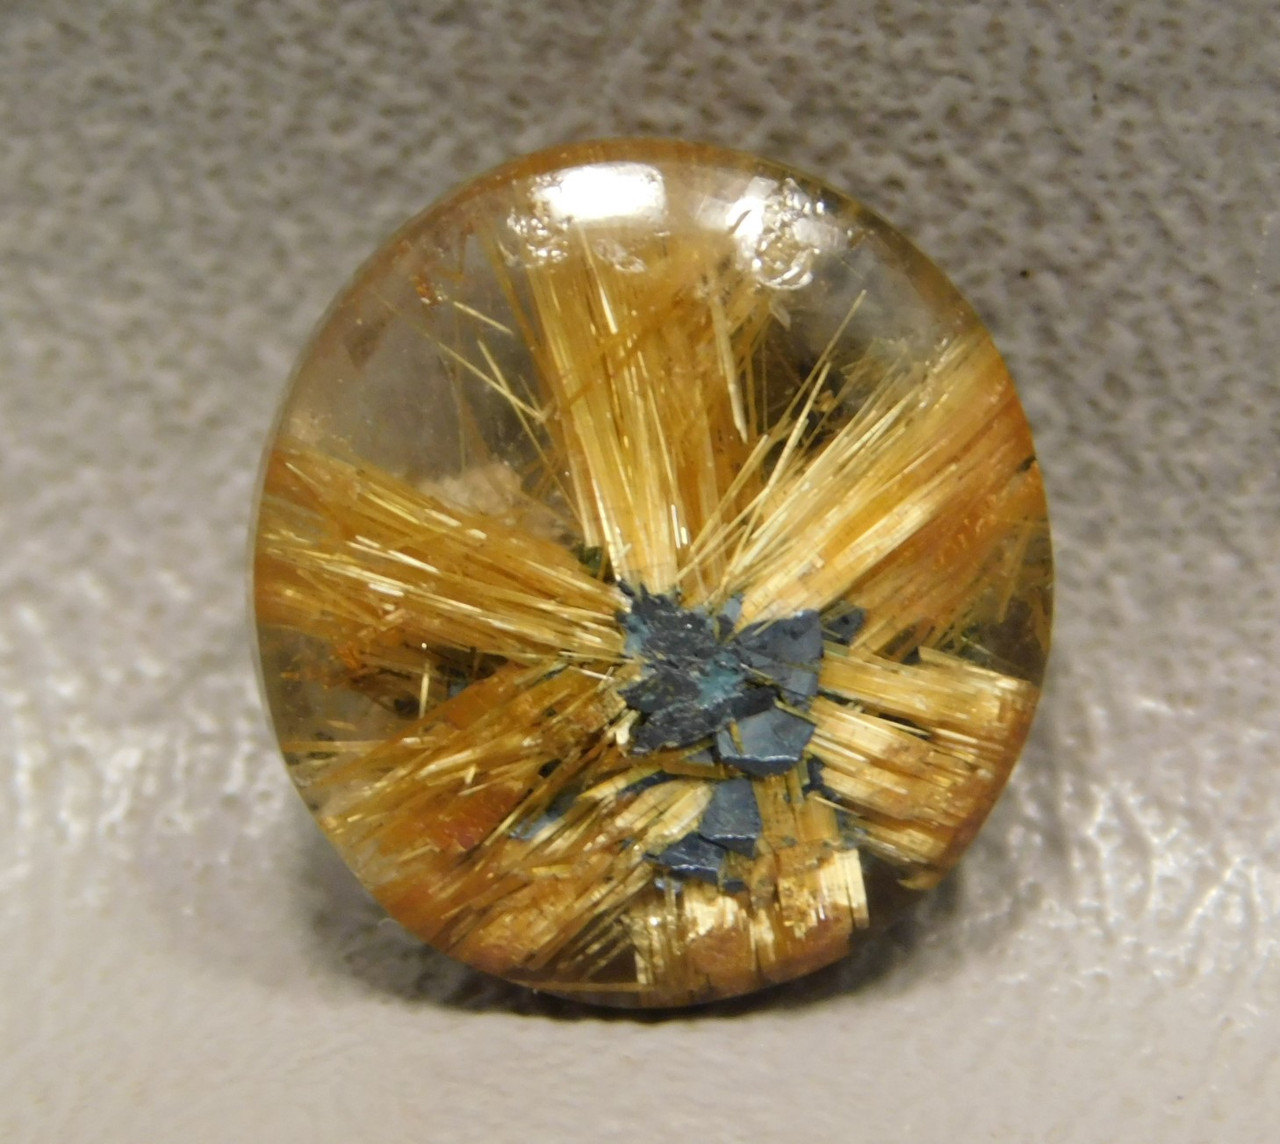 Star Rutile Quartz Rutilated Cabochon Small Round Shaped #SRQ7